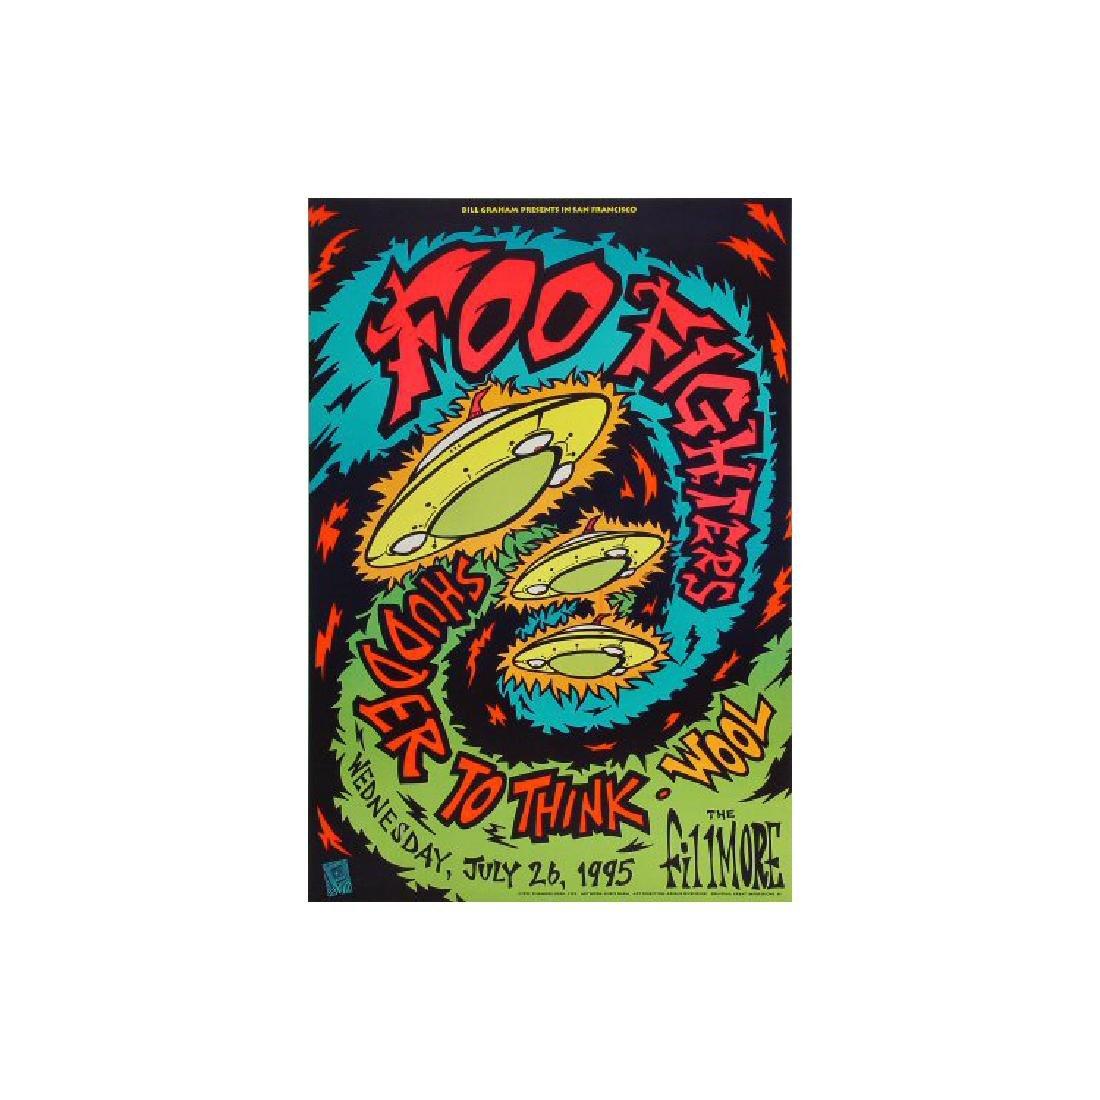 Foo Fighters - 1995 Concert Poster